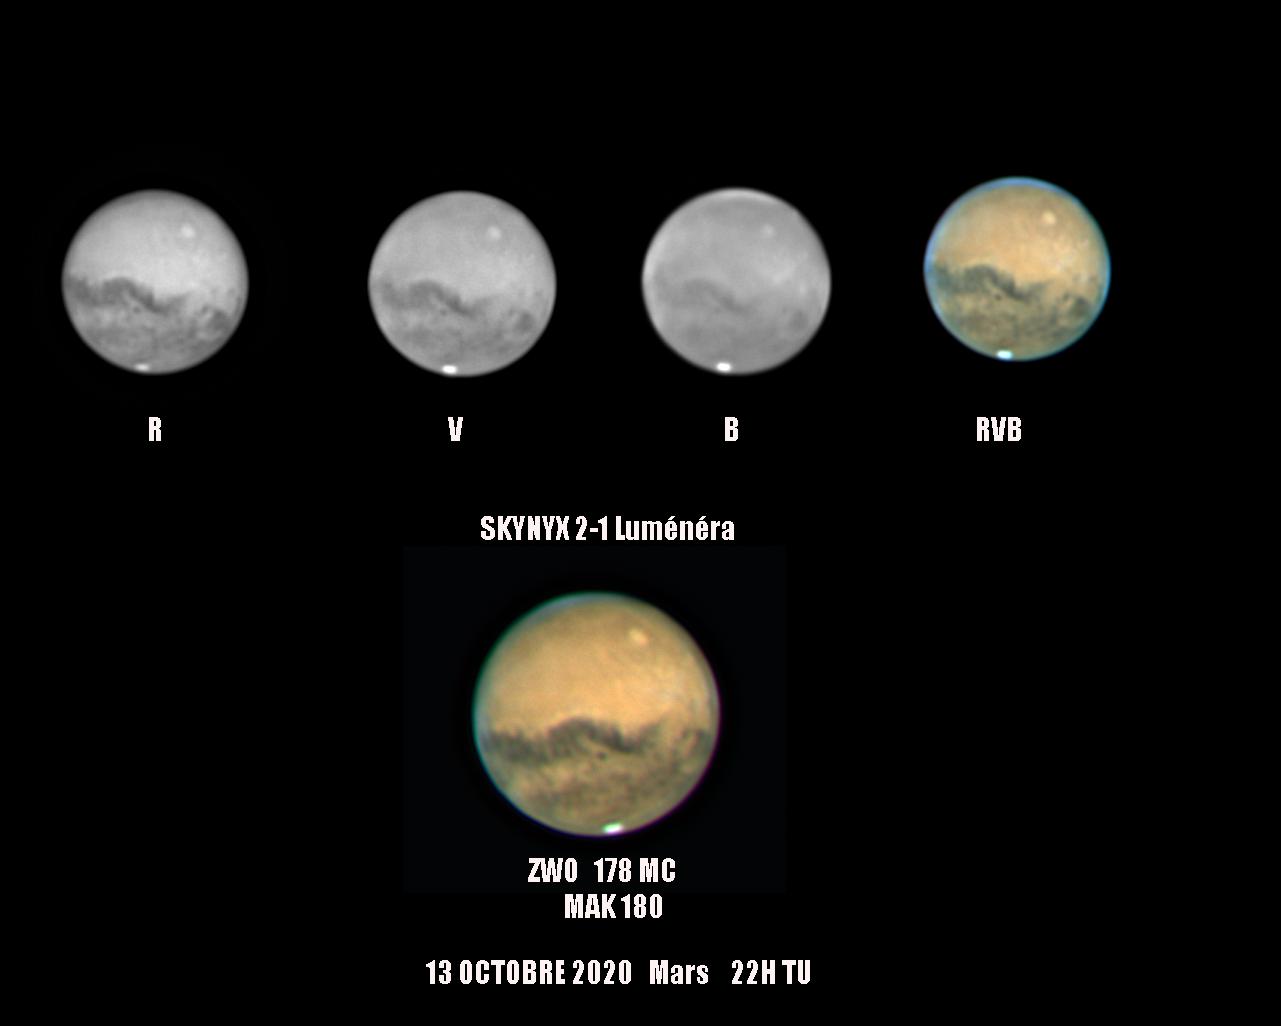 13 OCTOBRE 2020 OPPOSITION DE MARS.png